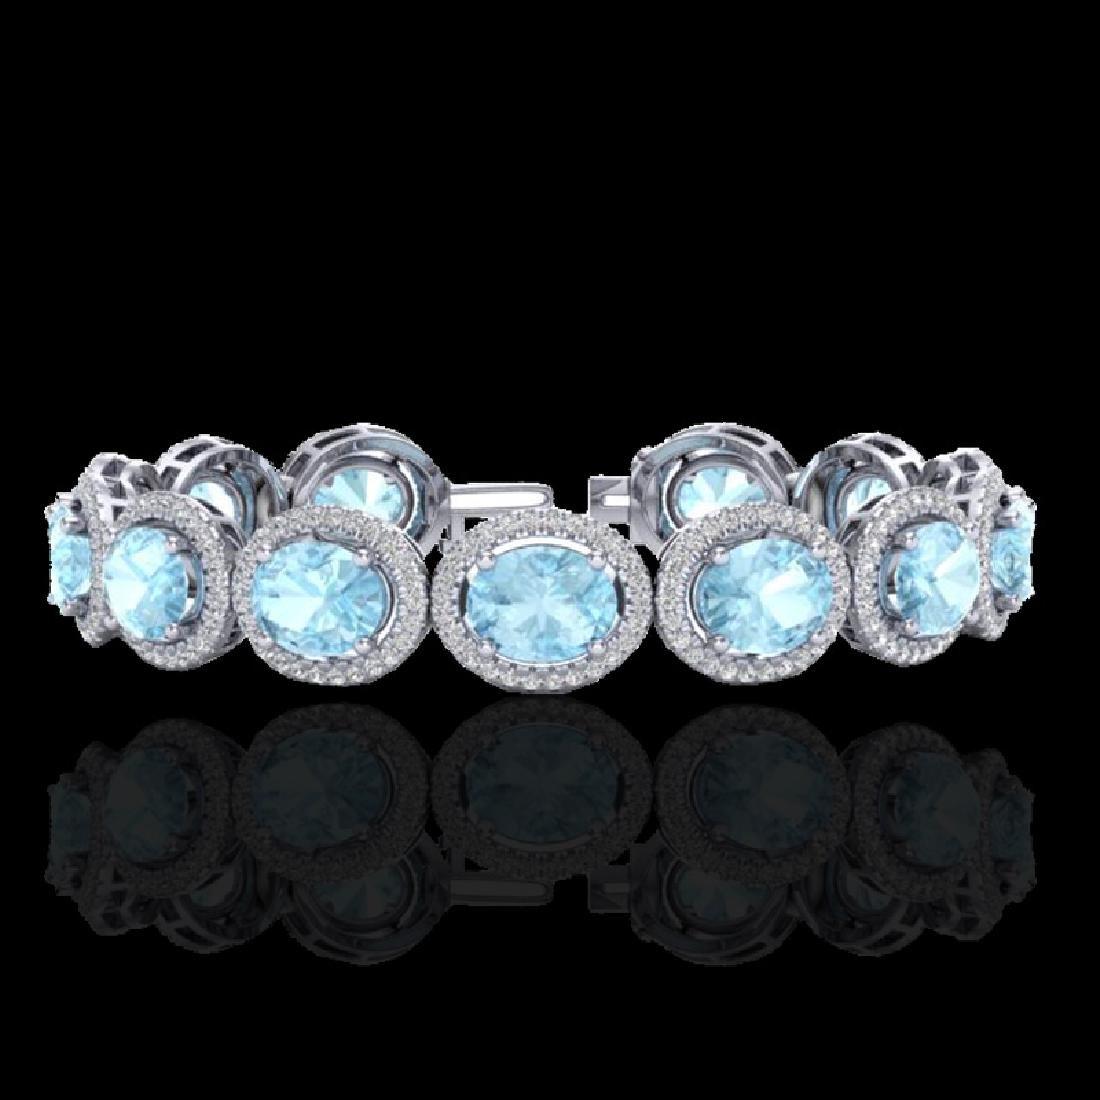 23 CTW Aquamarine & Micro Pave VS/SI Diamond Bracelet